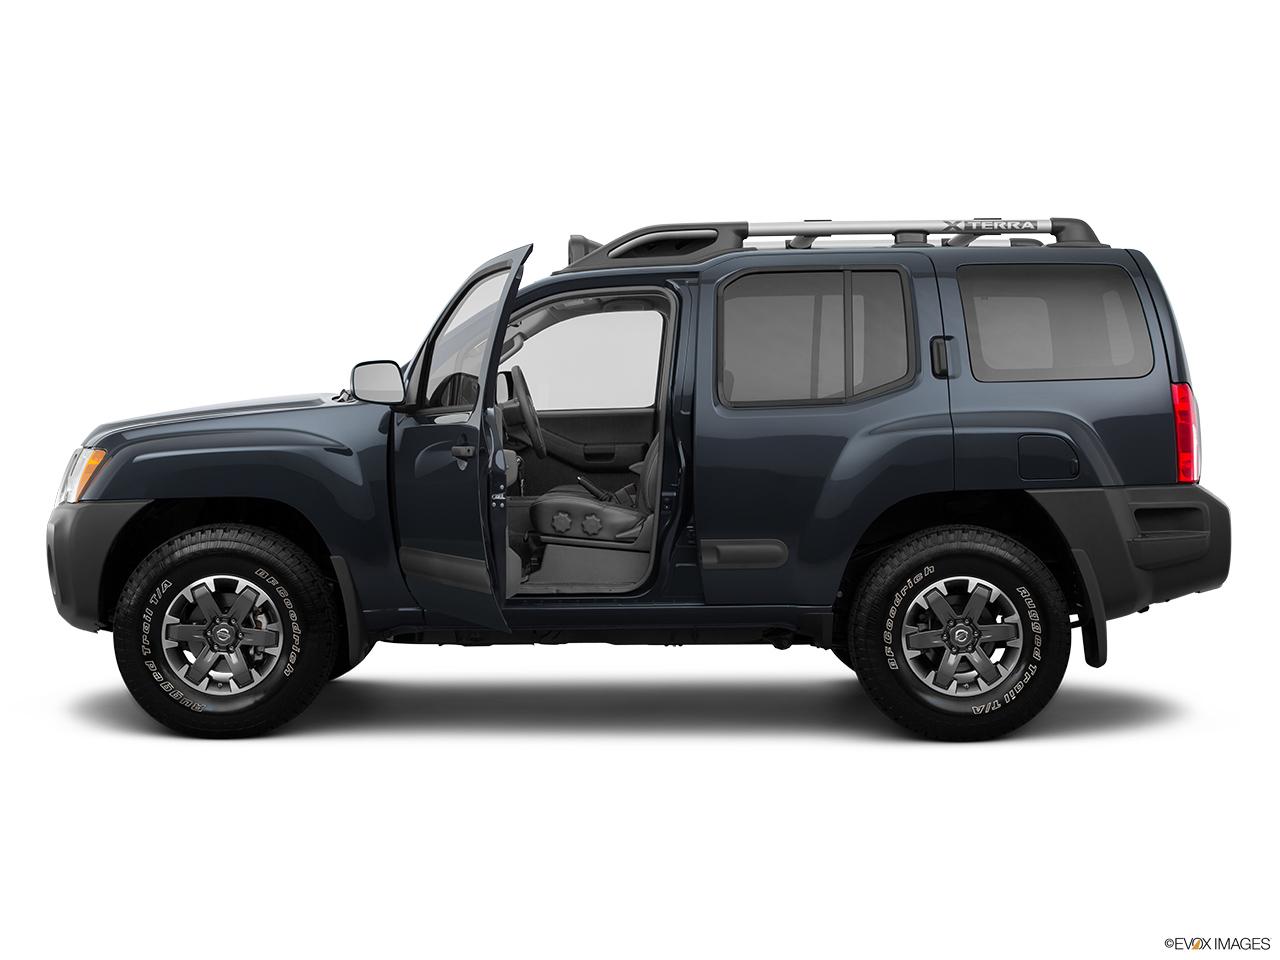 2015 Nissan Xterra 4WD 4 Door Auto Pro-4X - Front angle view 2015